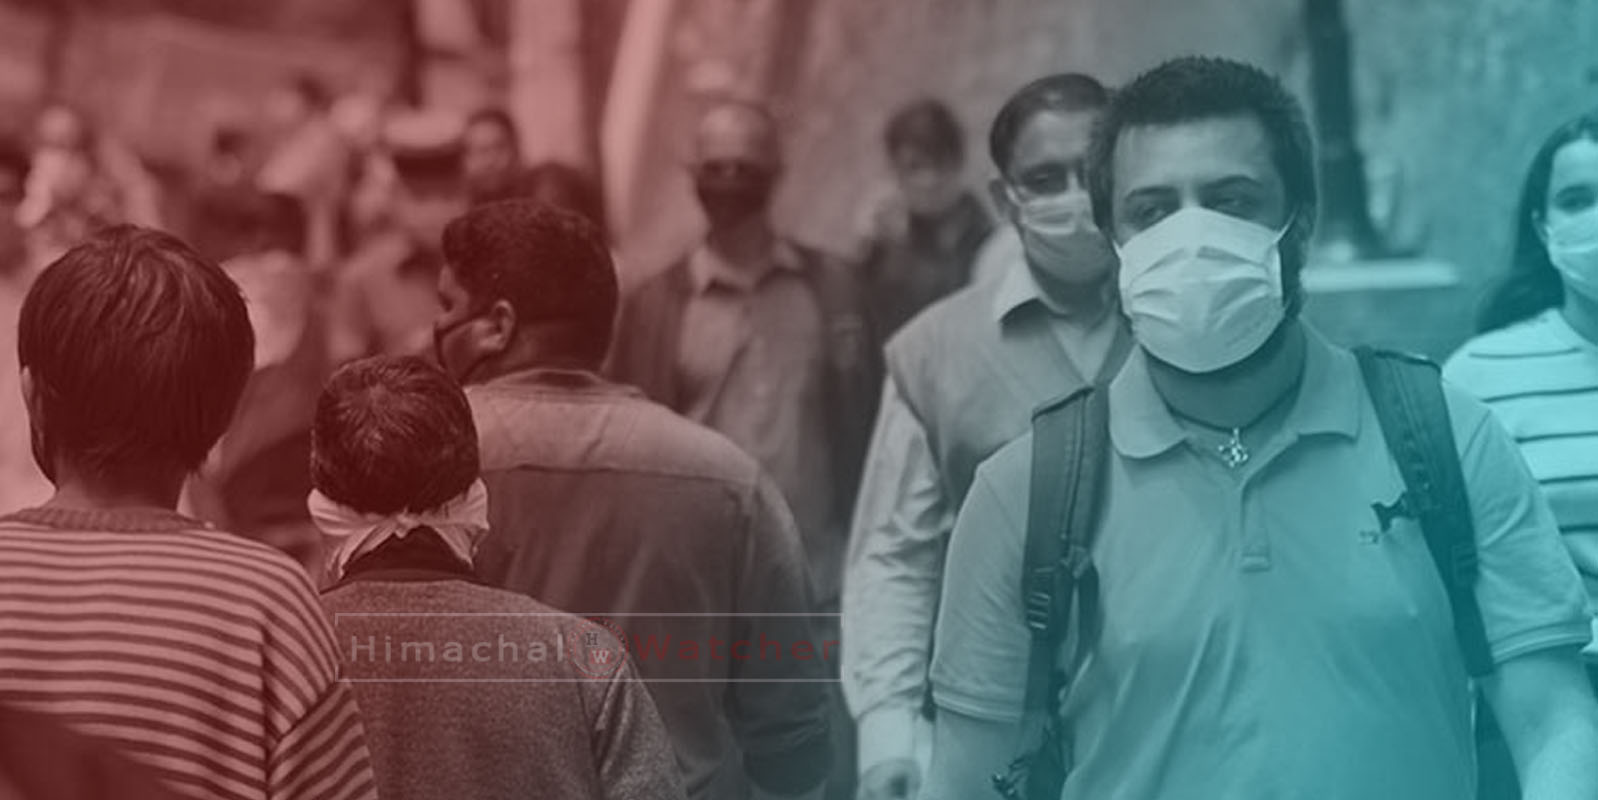 Himachal Pradesh-shimla covid-19 cases on the rise